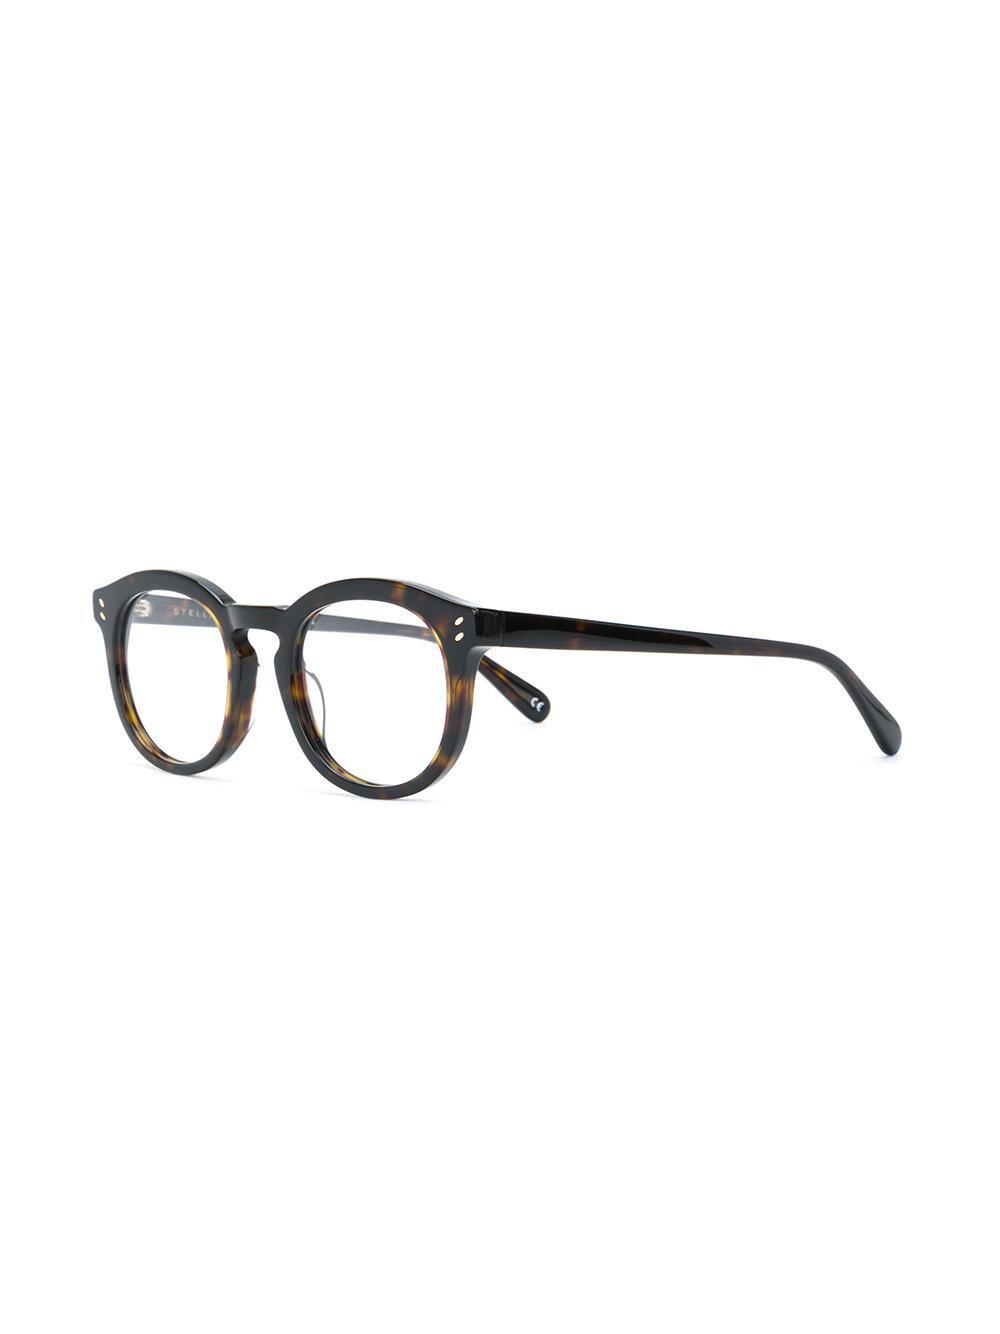 d22a5443cf Stella McCartney - Black Round Frame Glasses - Lyst. View fullscreen